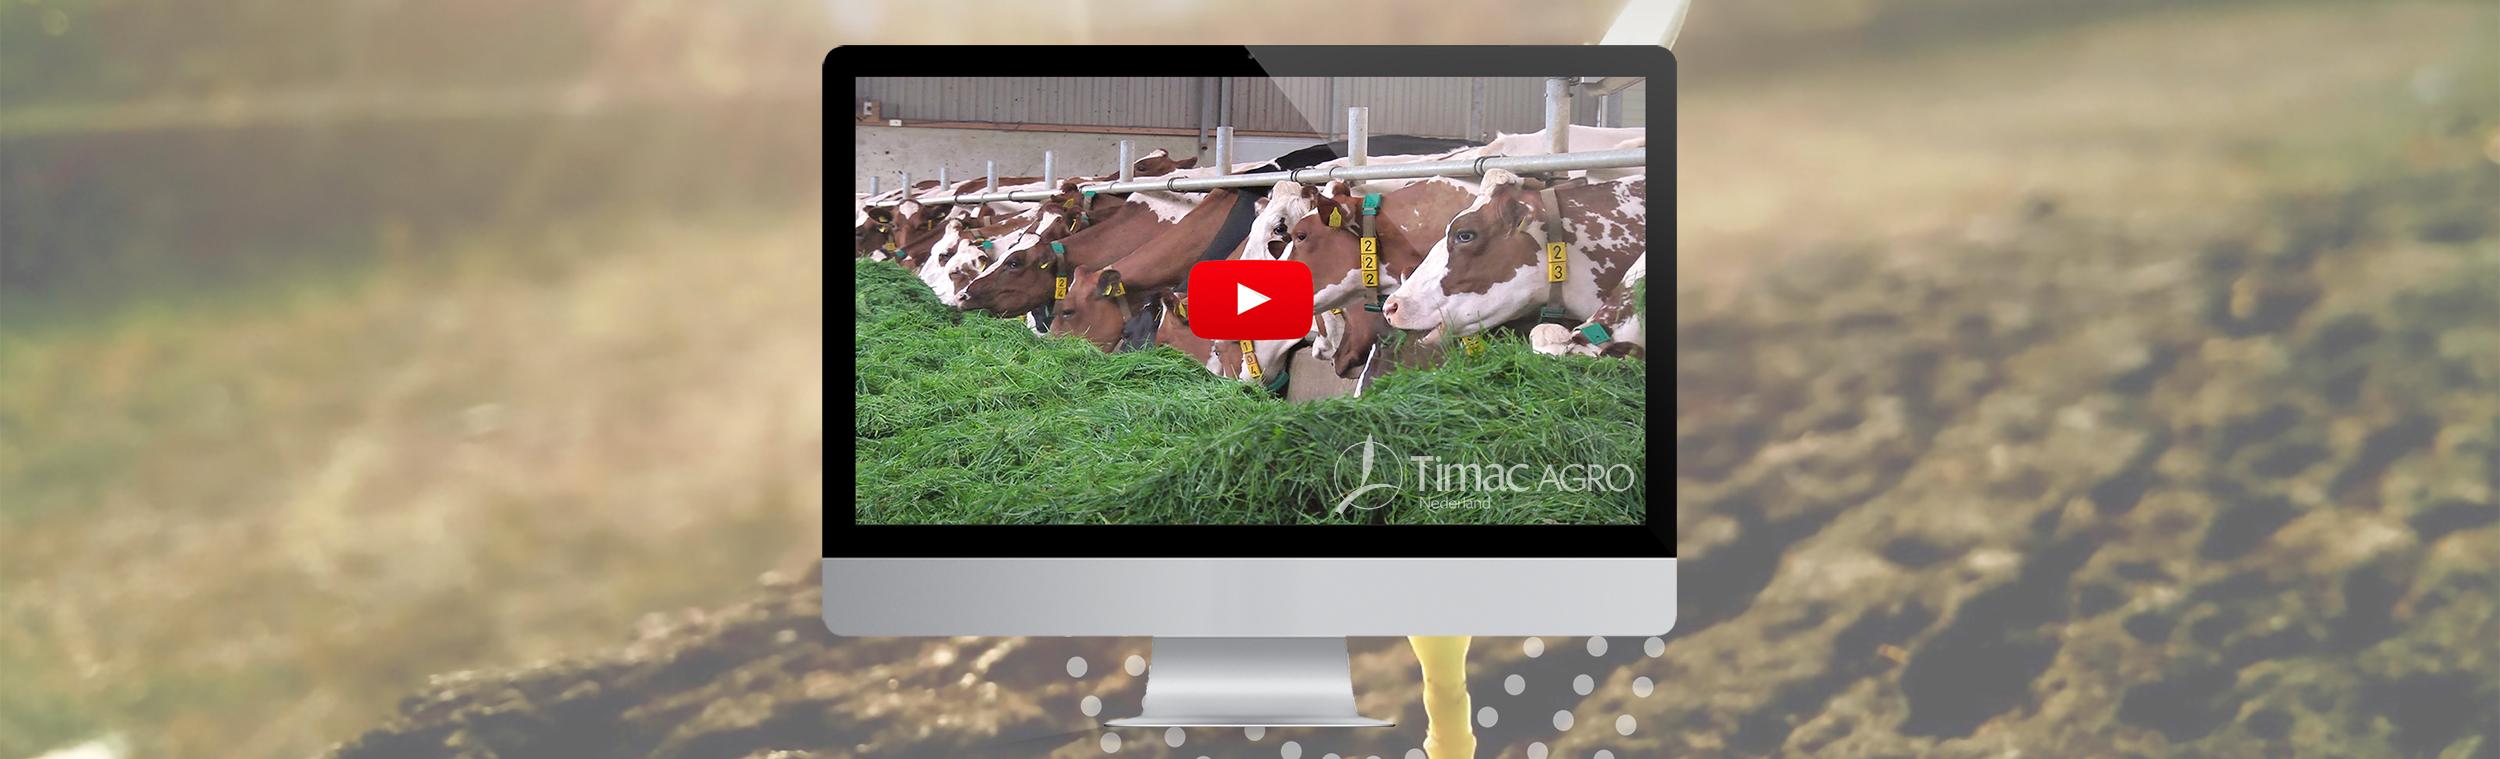 portfolio-timac-agro-gebruikersvideo1